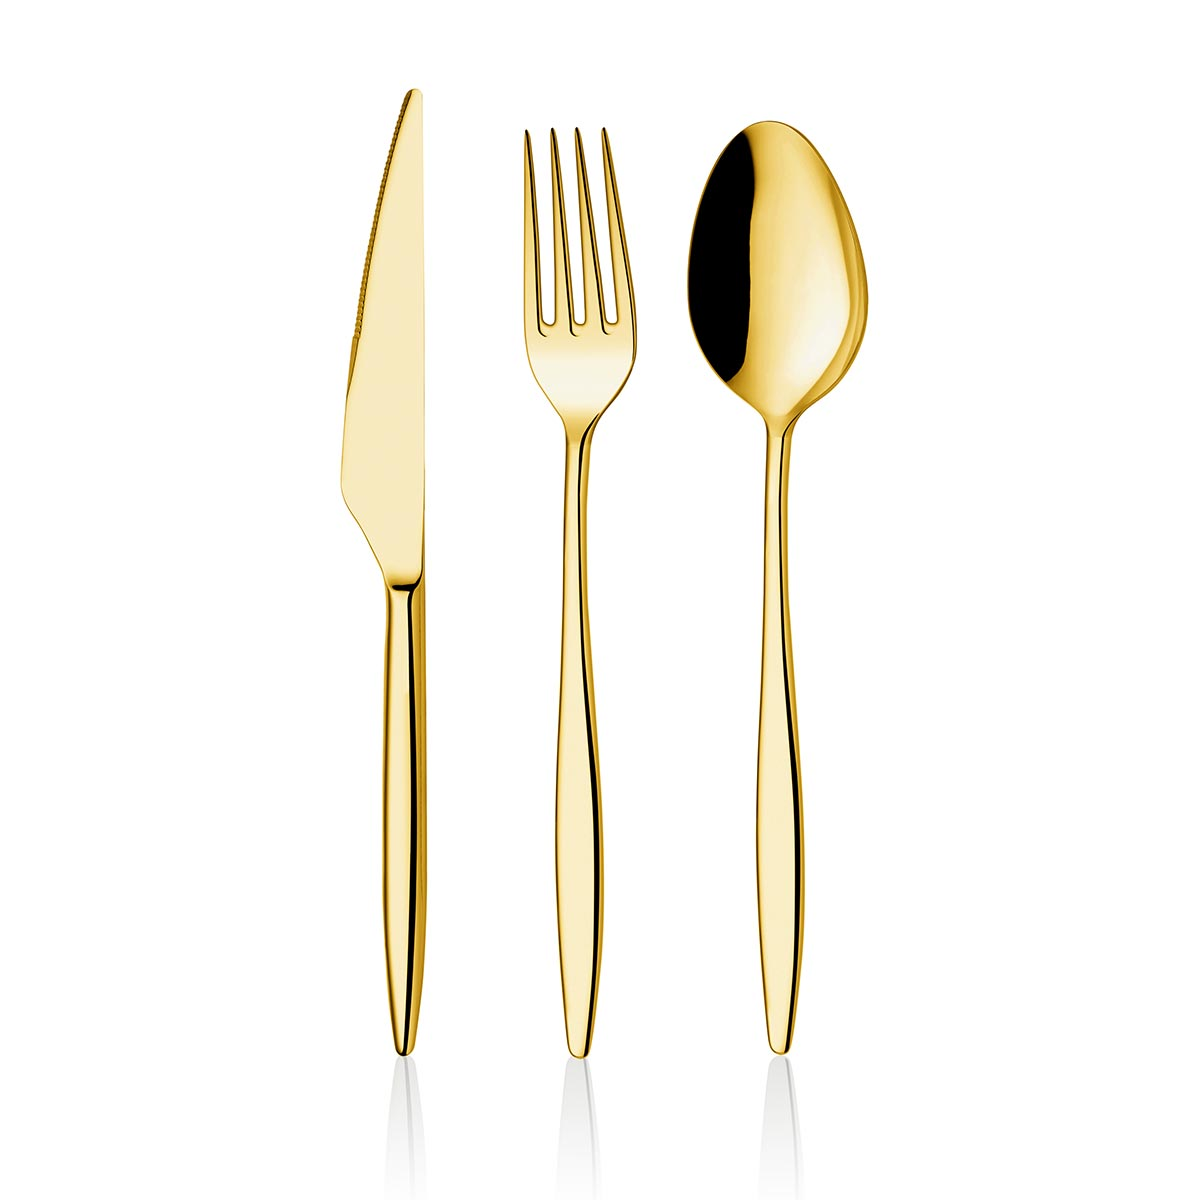 ONON Assos Altın Titanyum 72 Parça Çatal Kaşık Bıçak Takımı Kutu 1